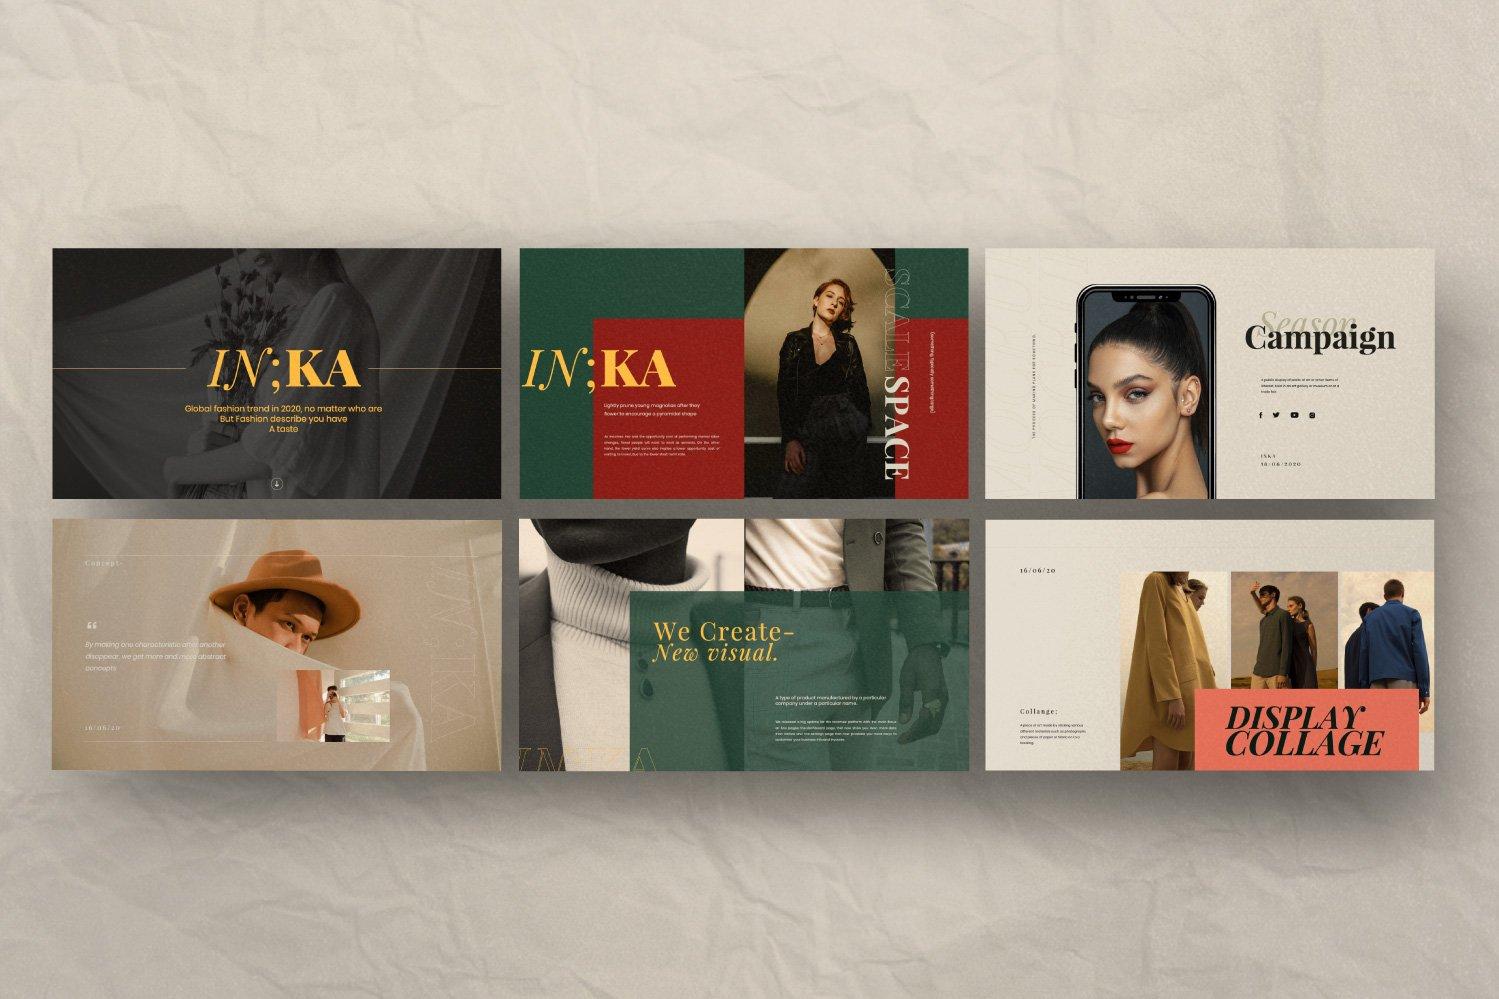 时尚创意服装摄影作品集幻灯片设计模板 Iconic – Fashion Lookbook PowerPoint插图(5)